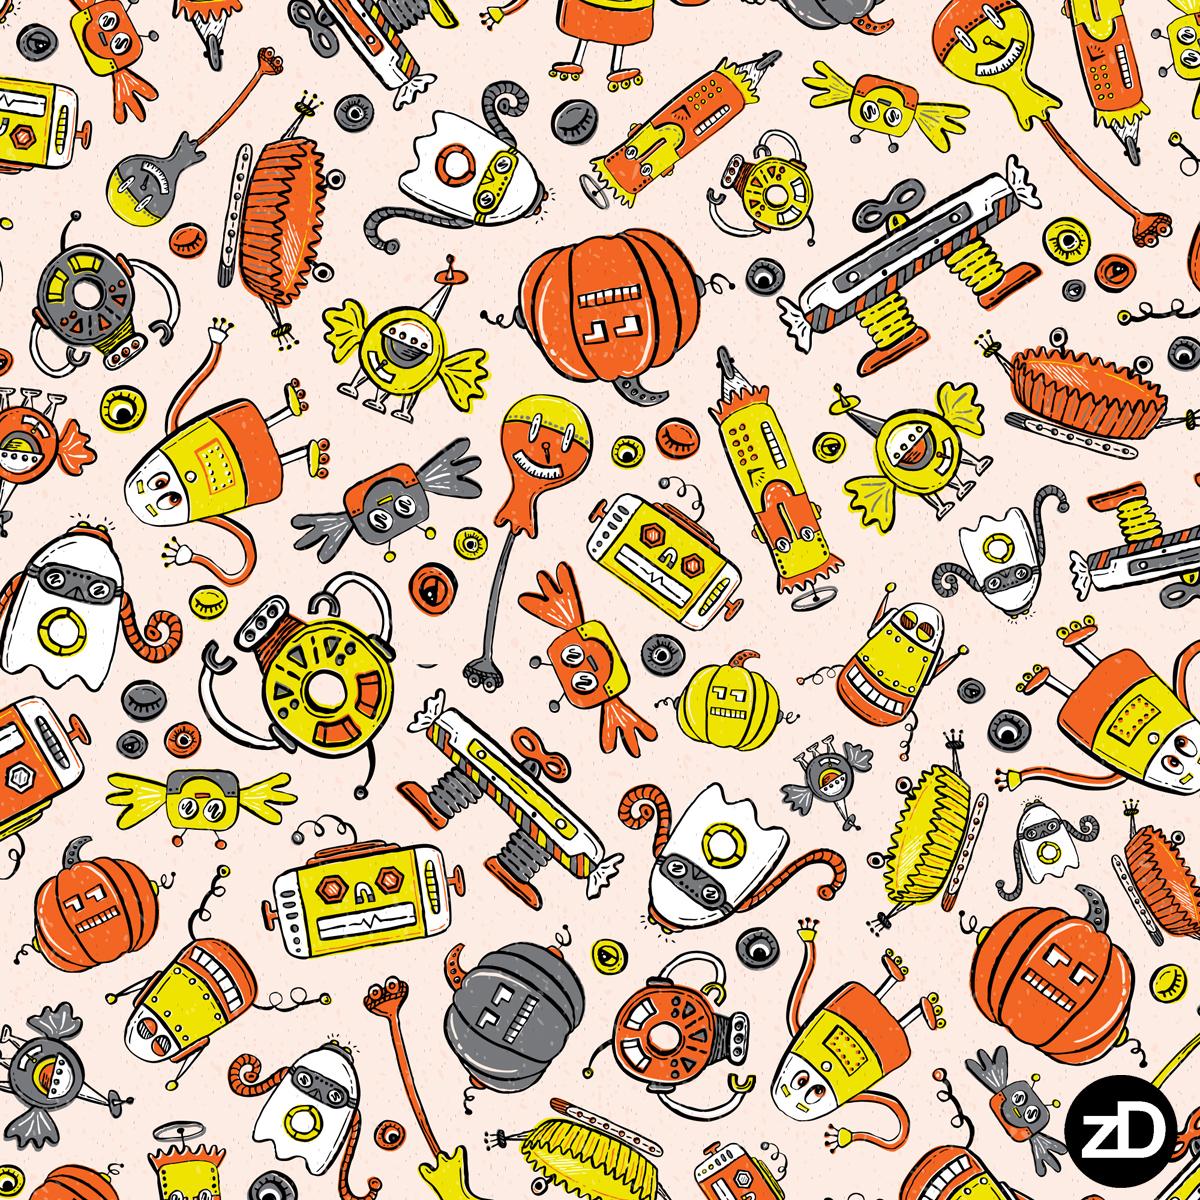 Zirkus Design | Halloween Candy Robots Collection - Three Color Halloween Fabric - SCATTER